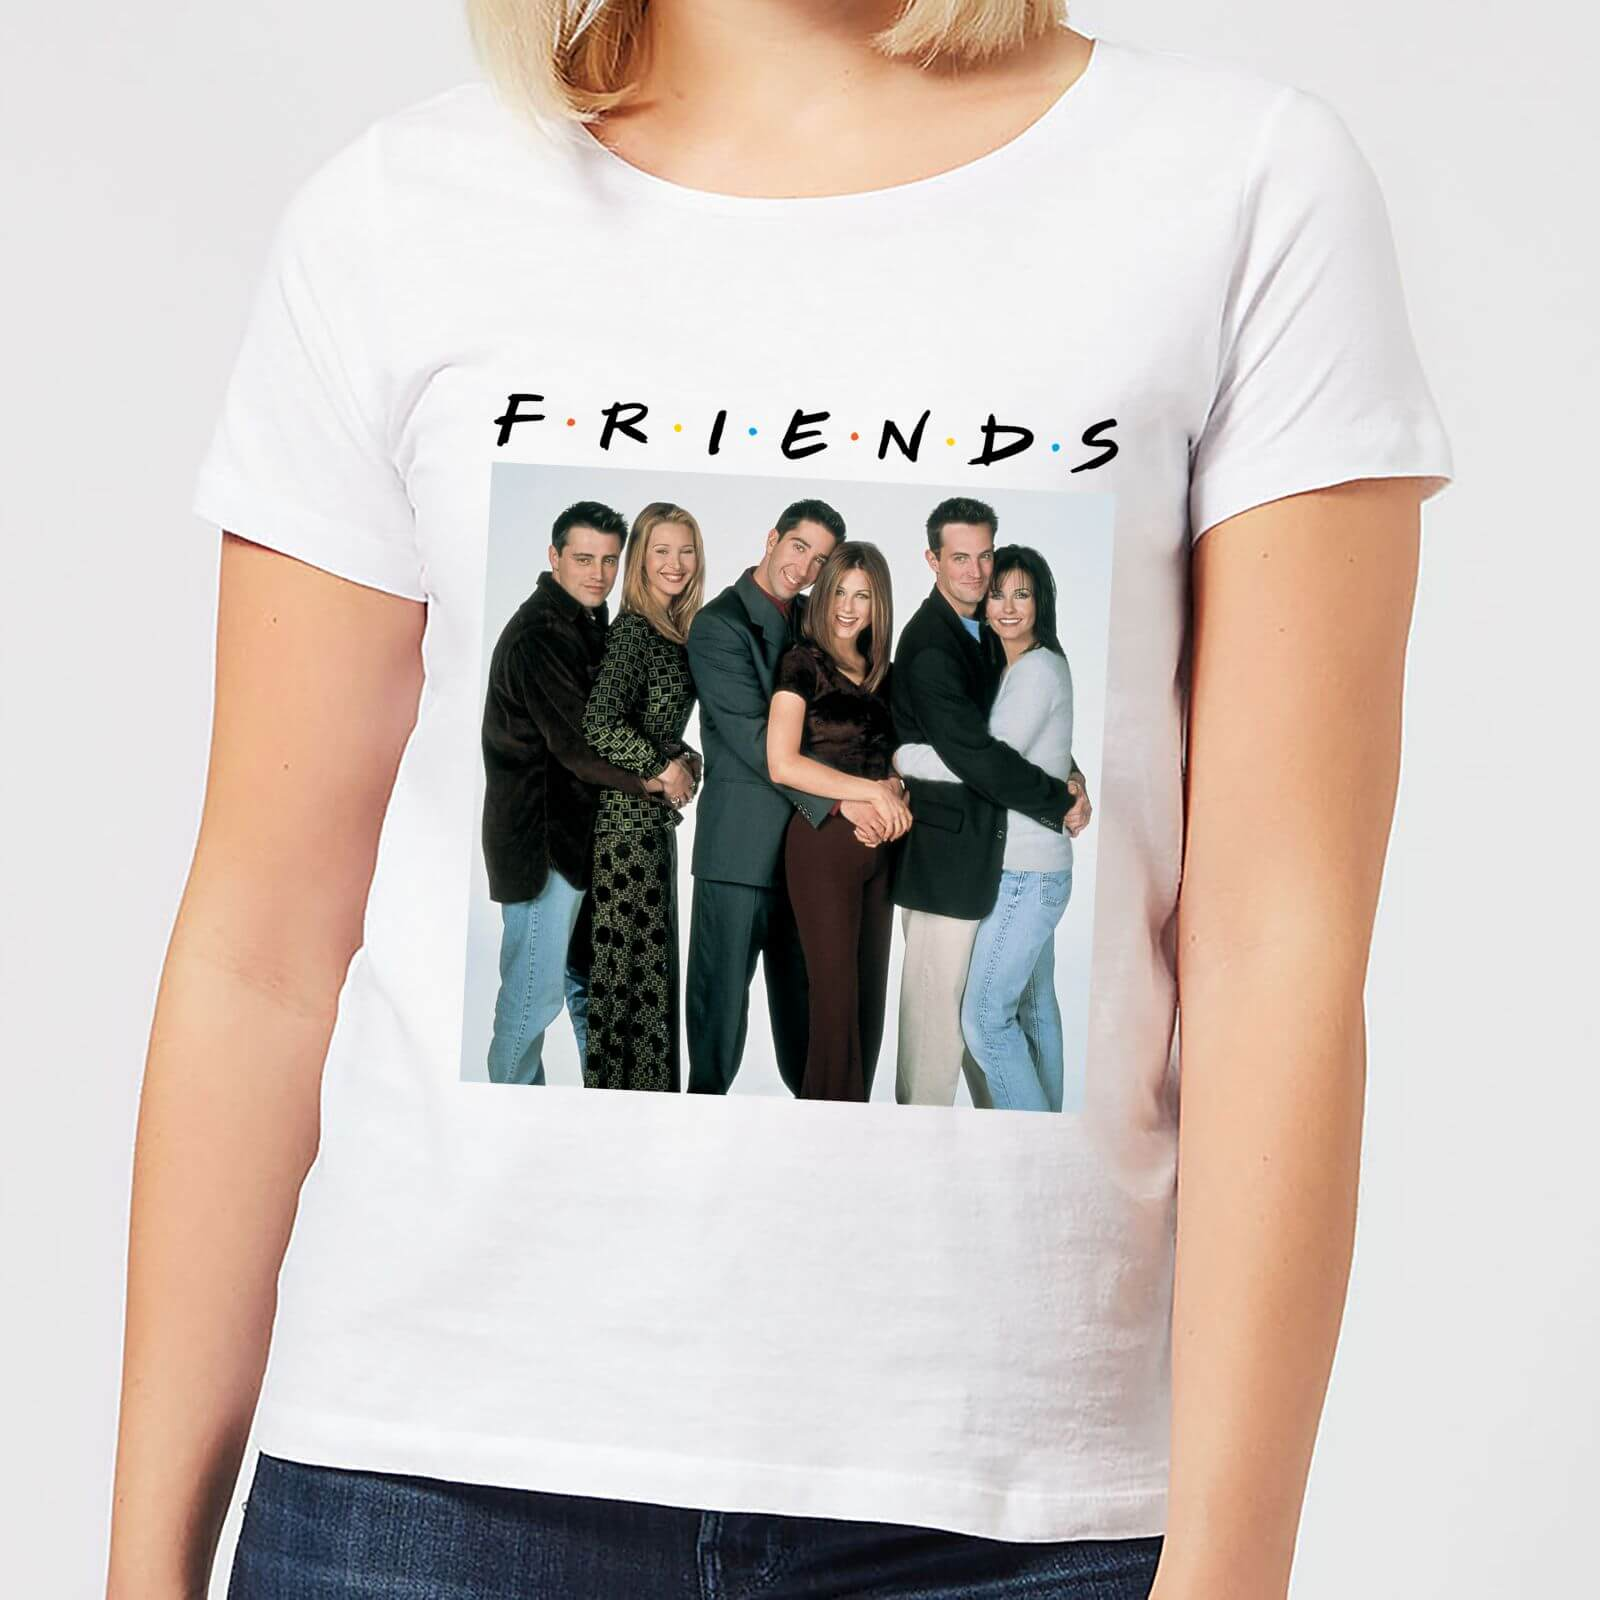 Femme Friends Shirt Blanc T Groupe Le DYeW2EH9I